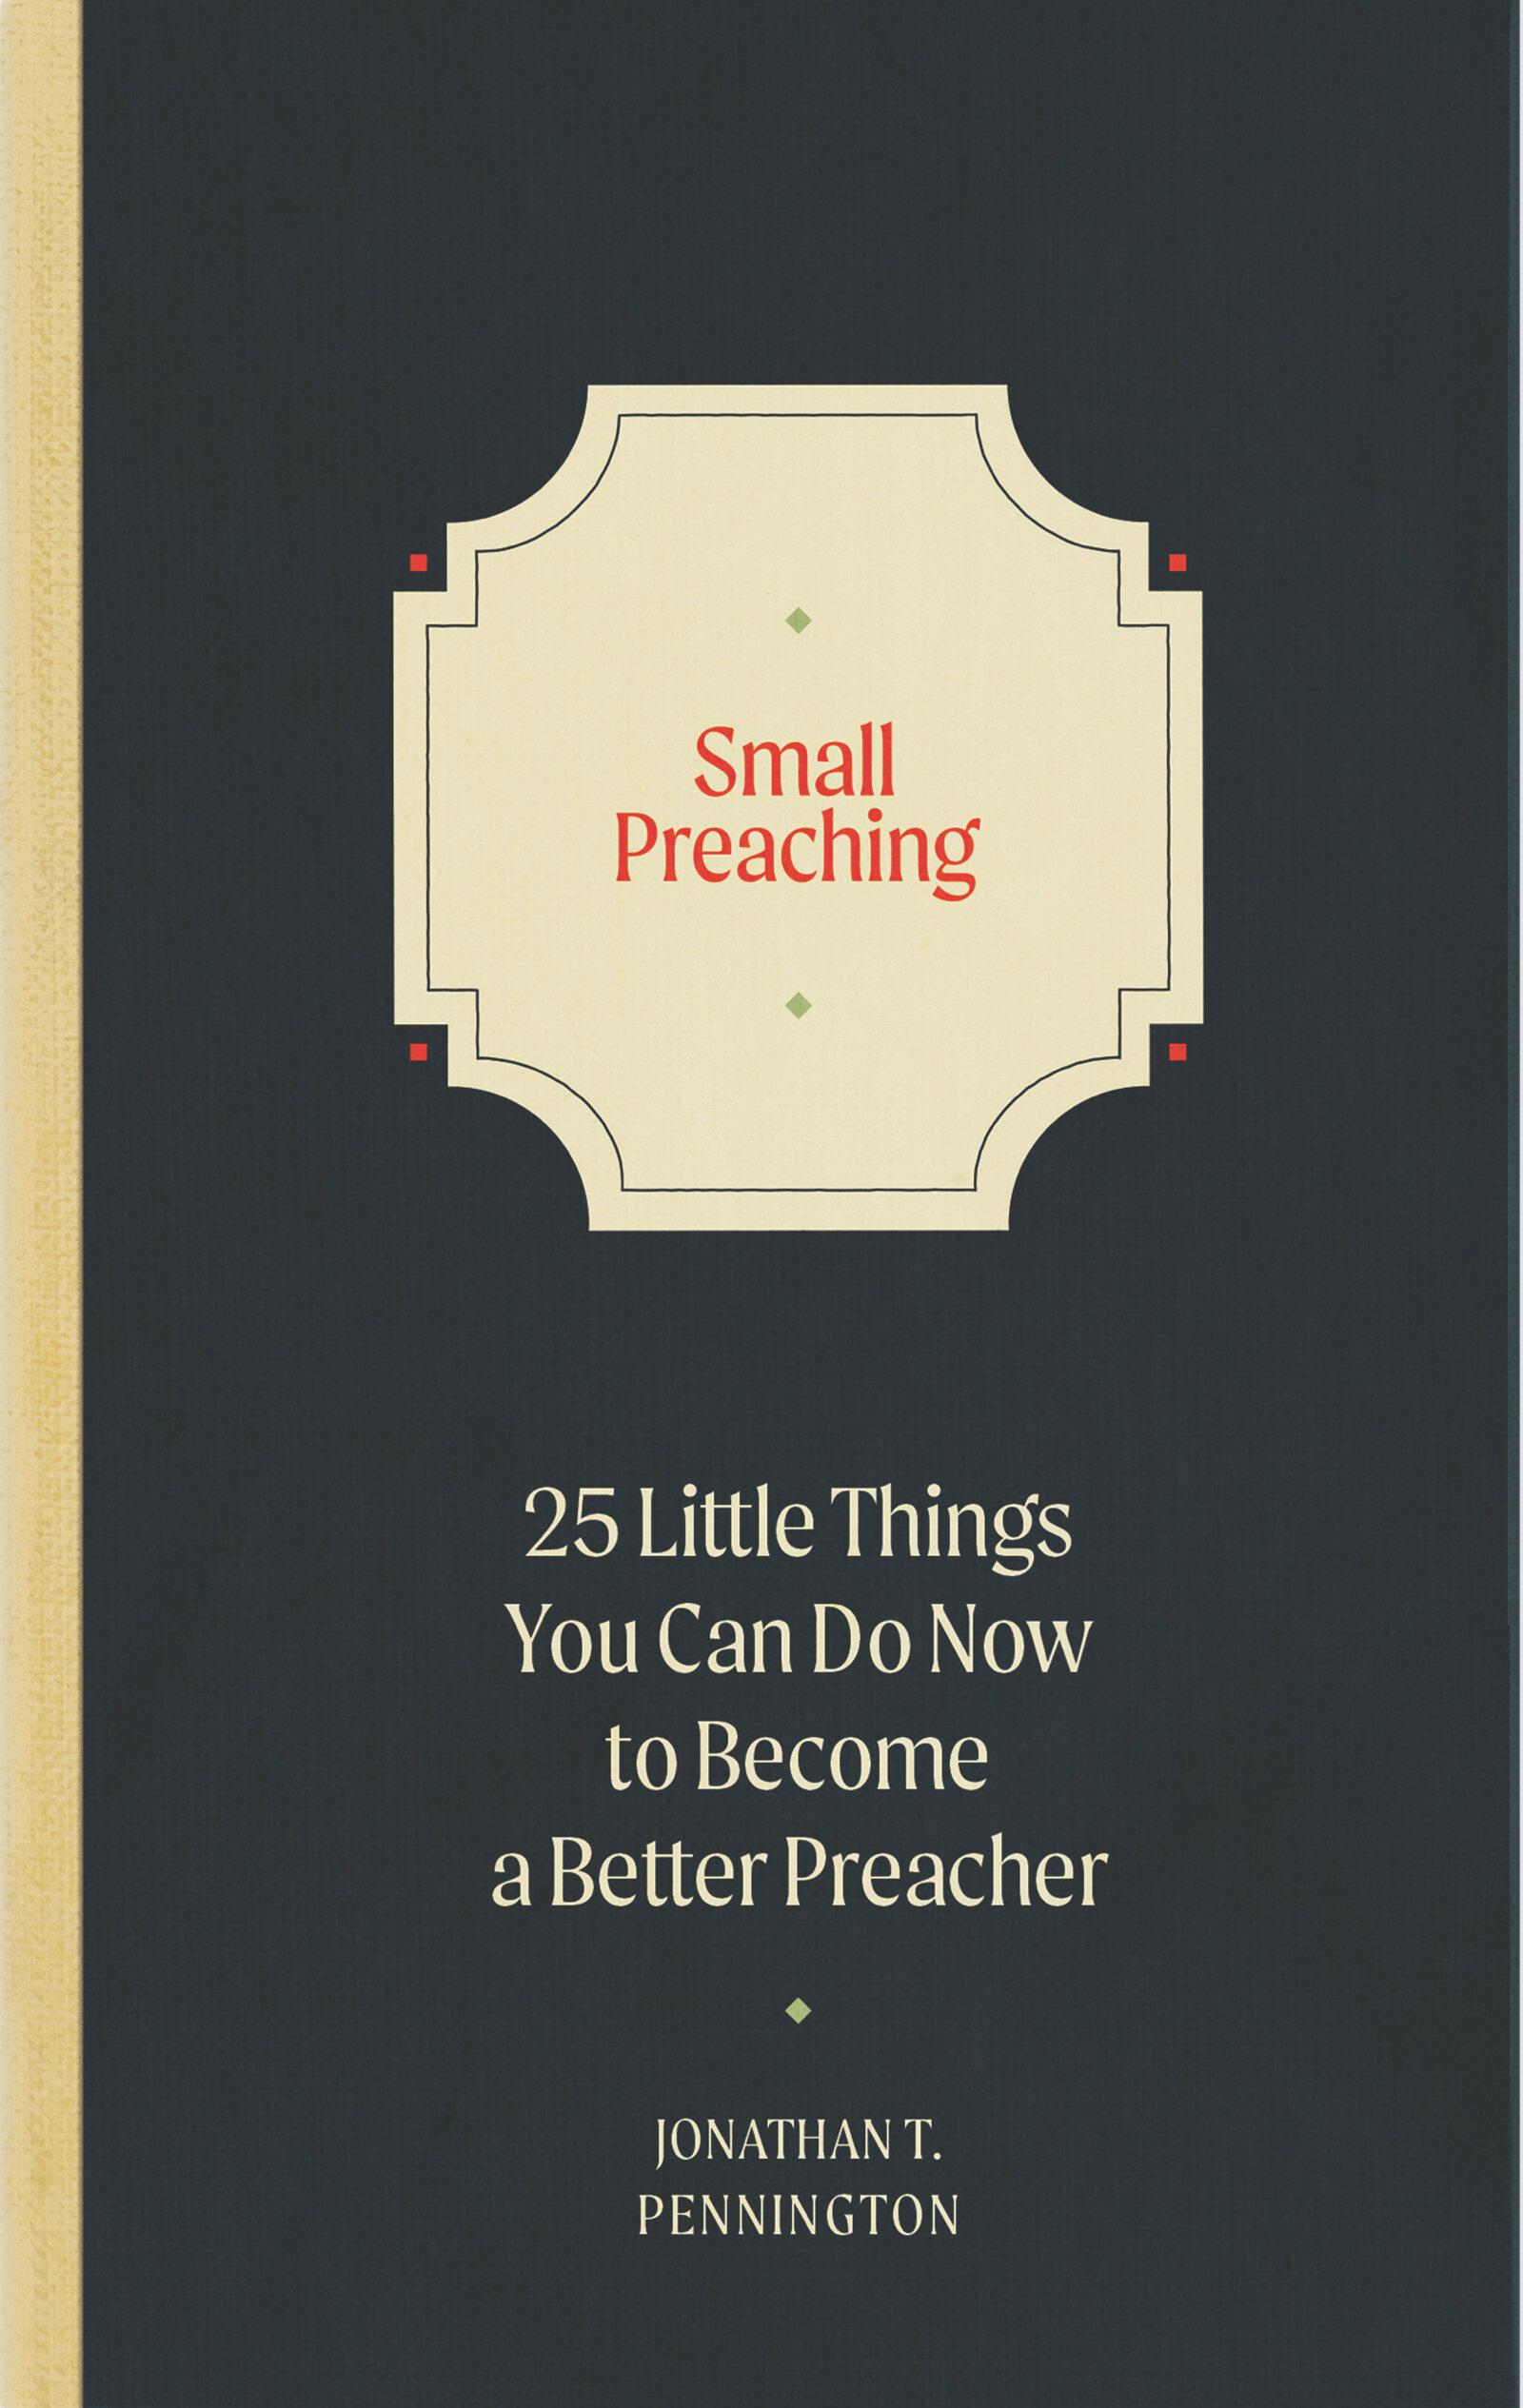 Small Preaching